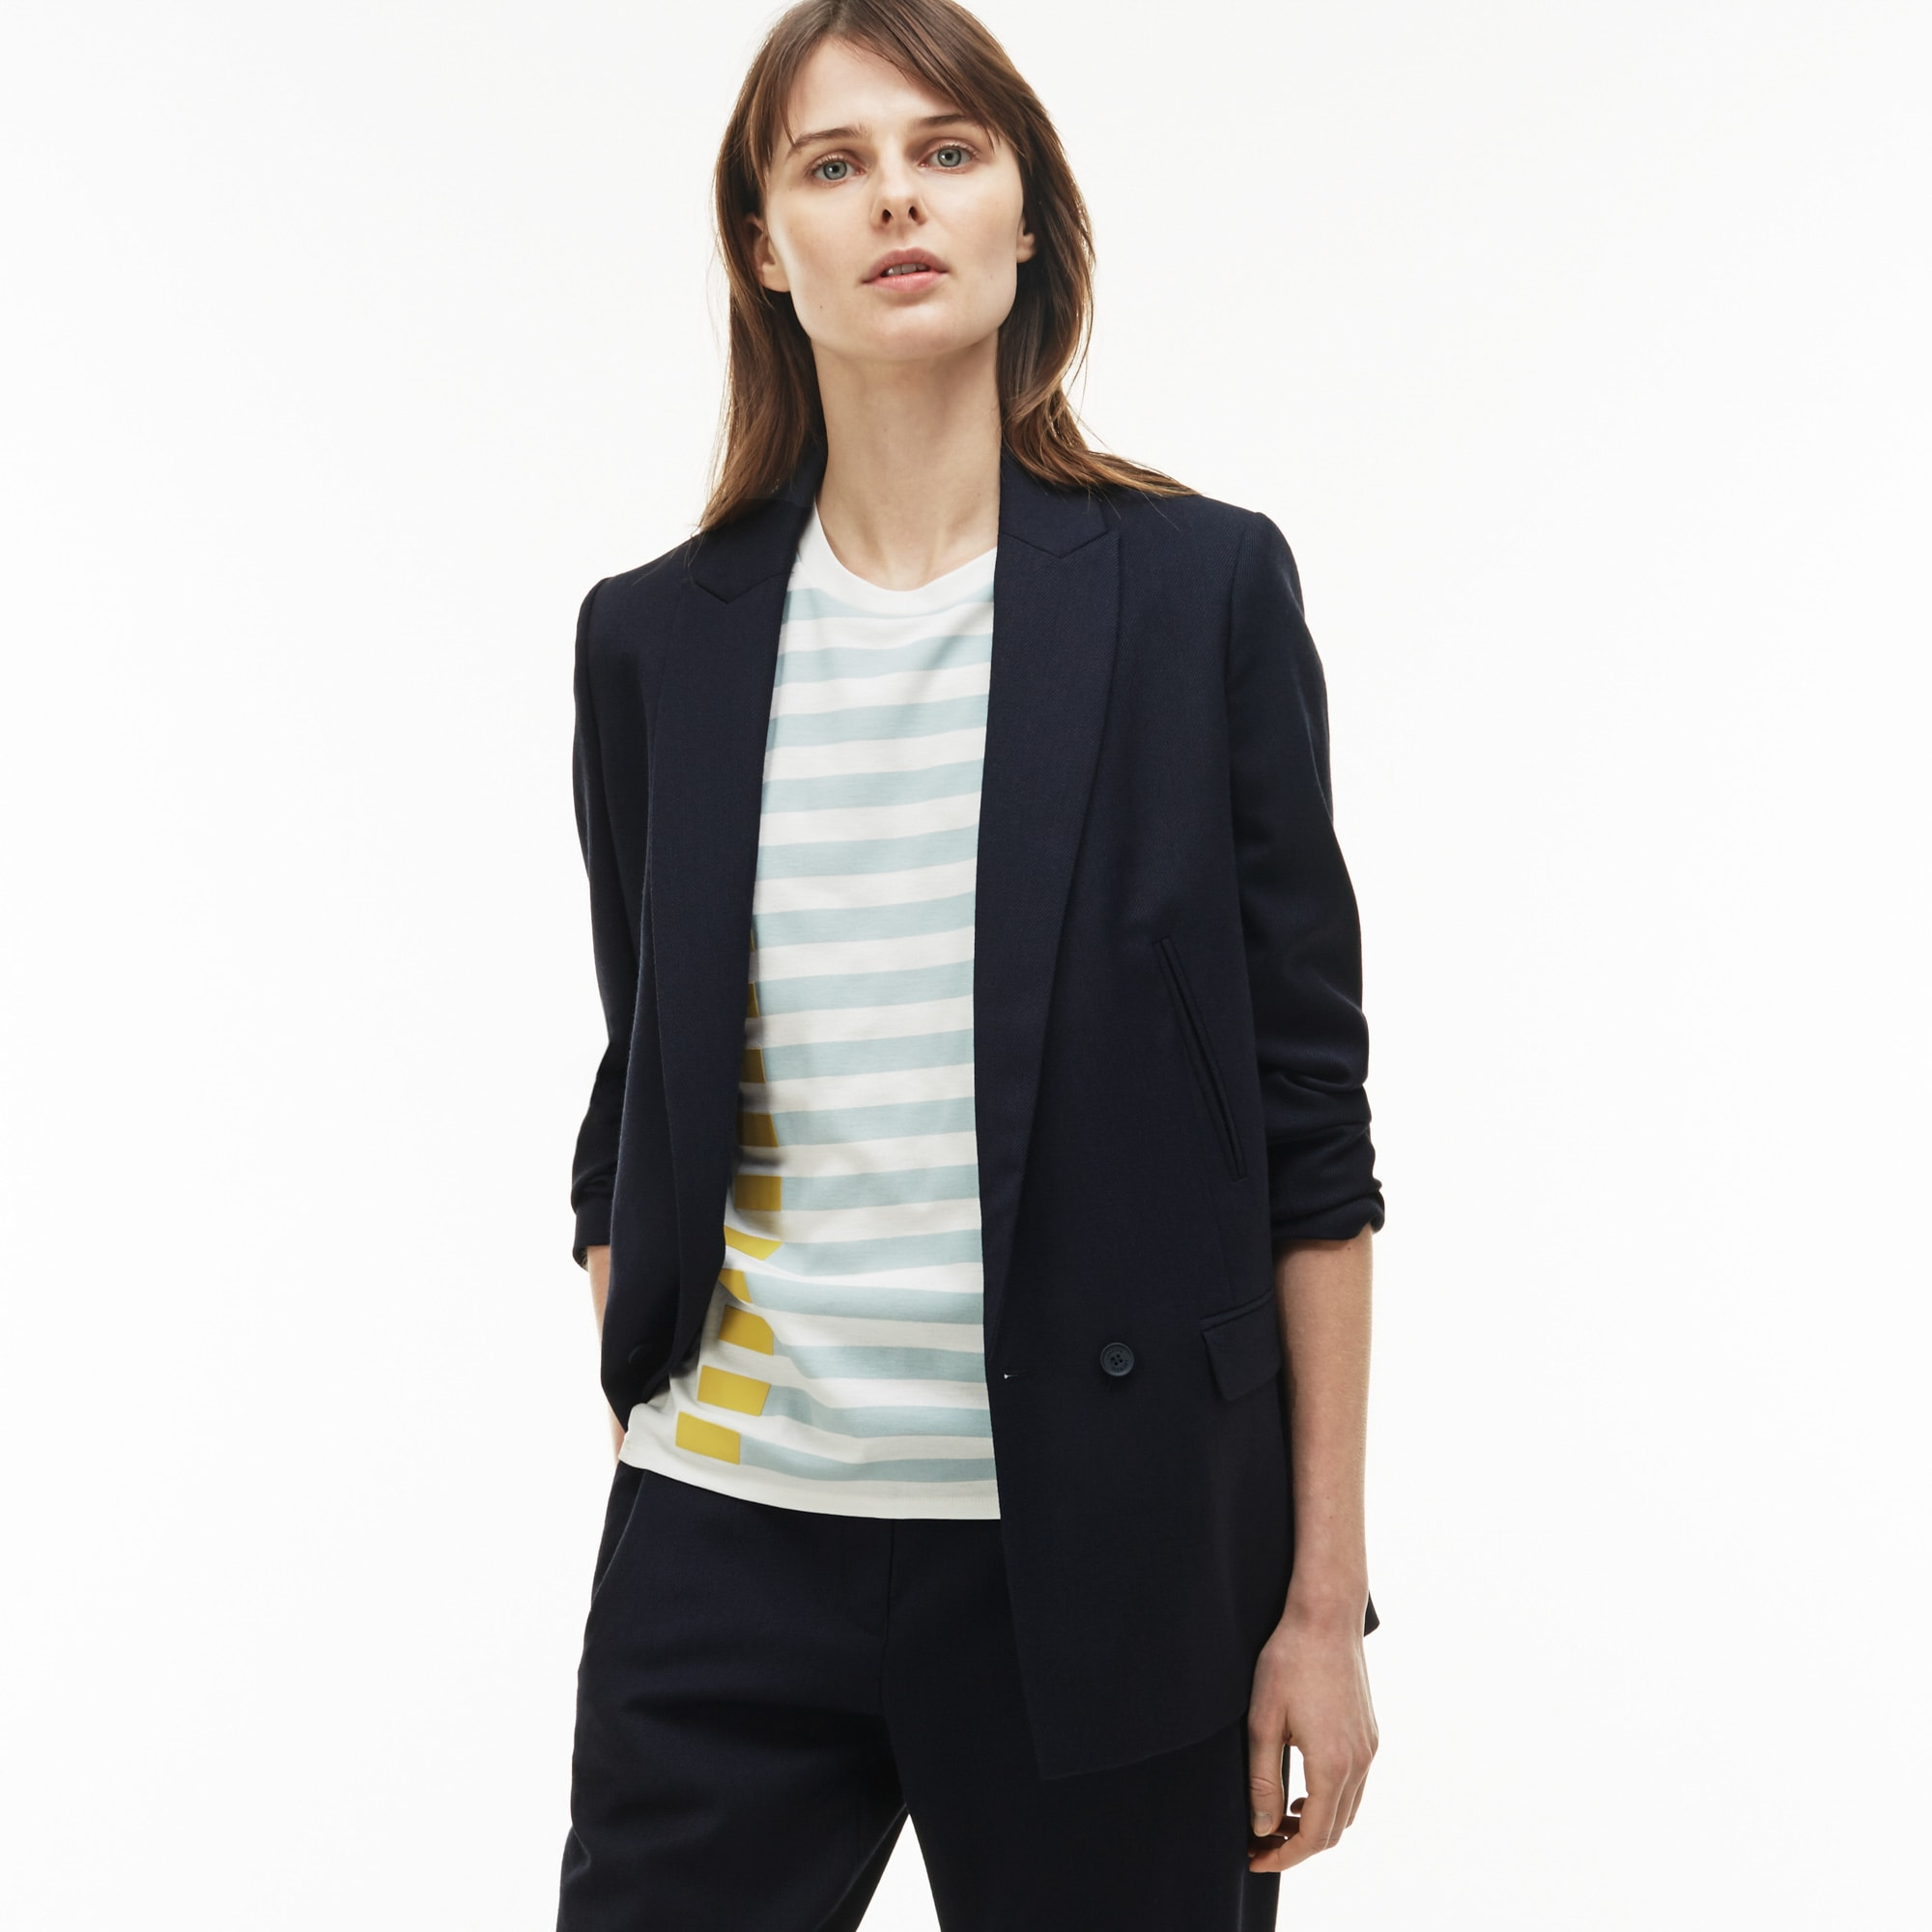 Women's Straight Cut Buttoned Wool Piqué Jacket